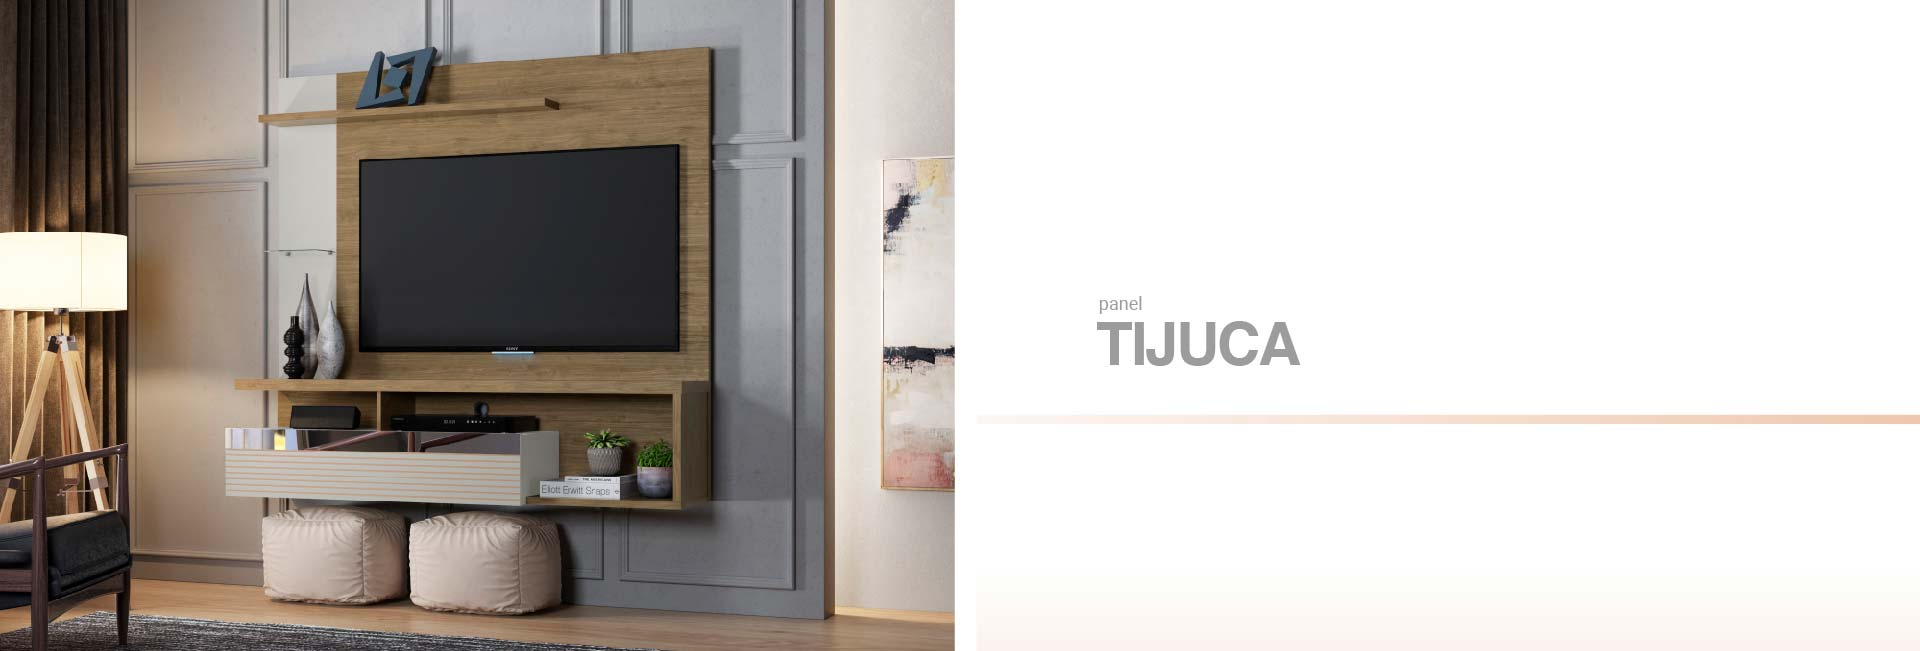 Panel Tijuca